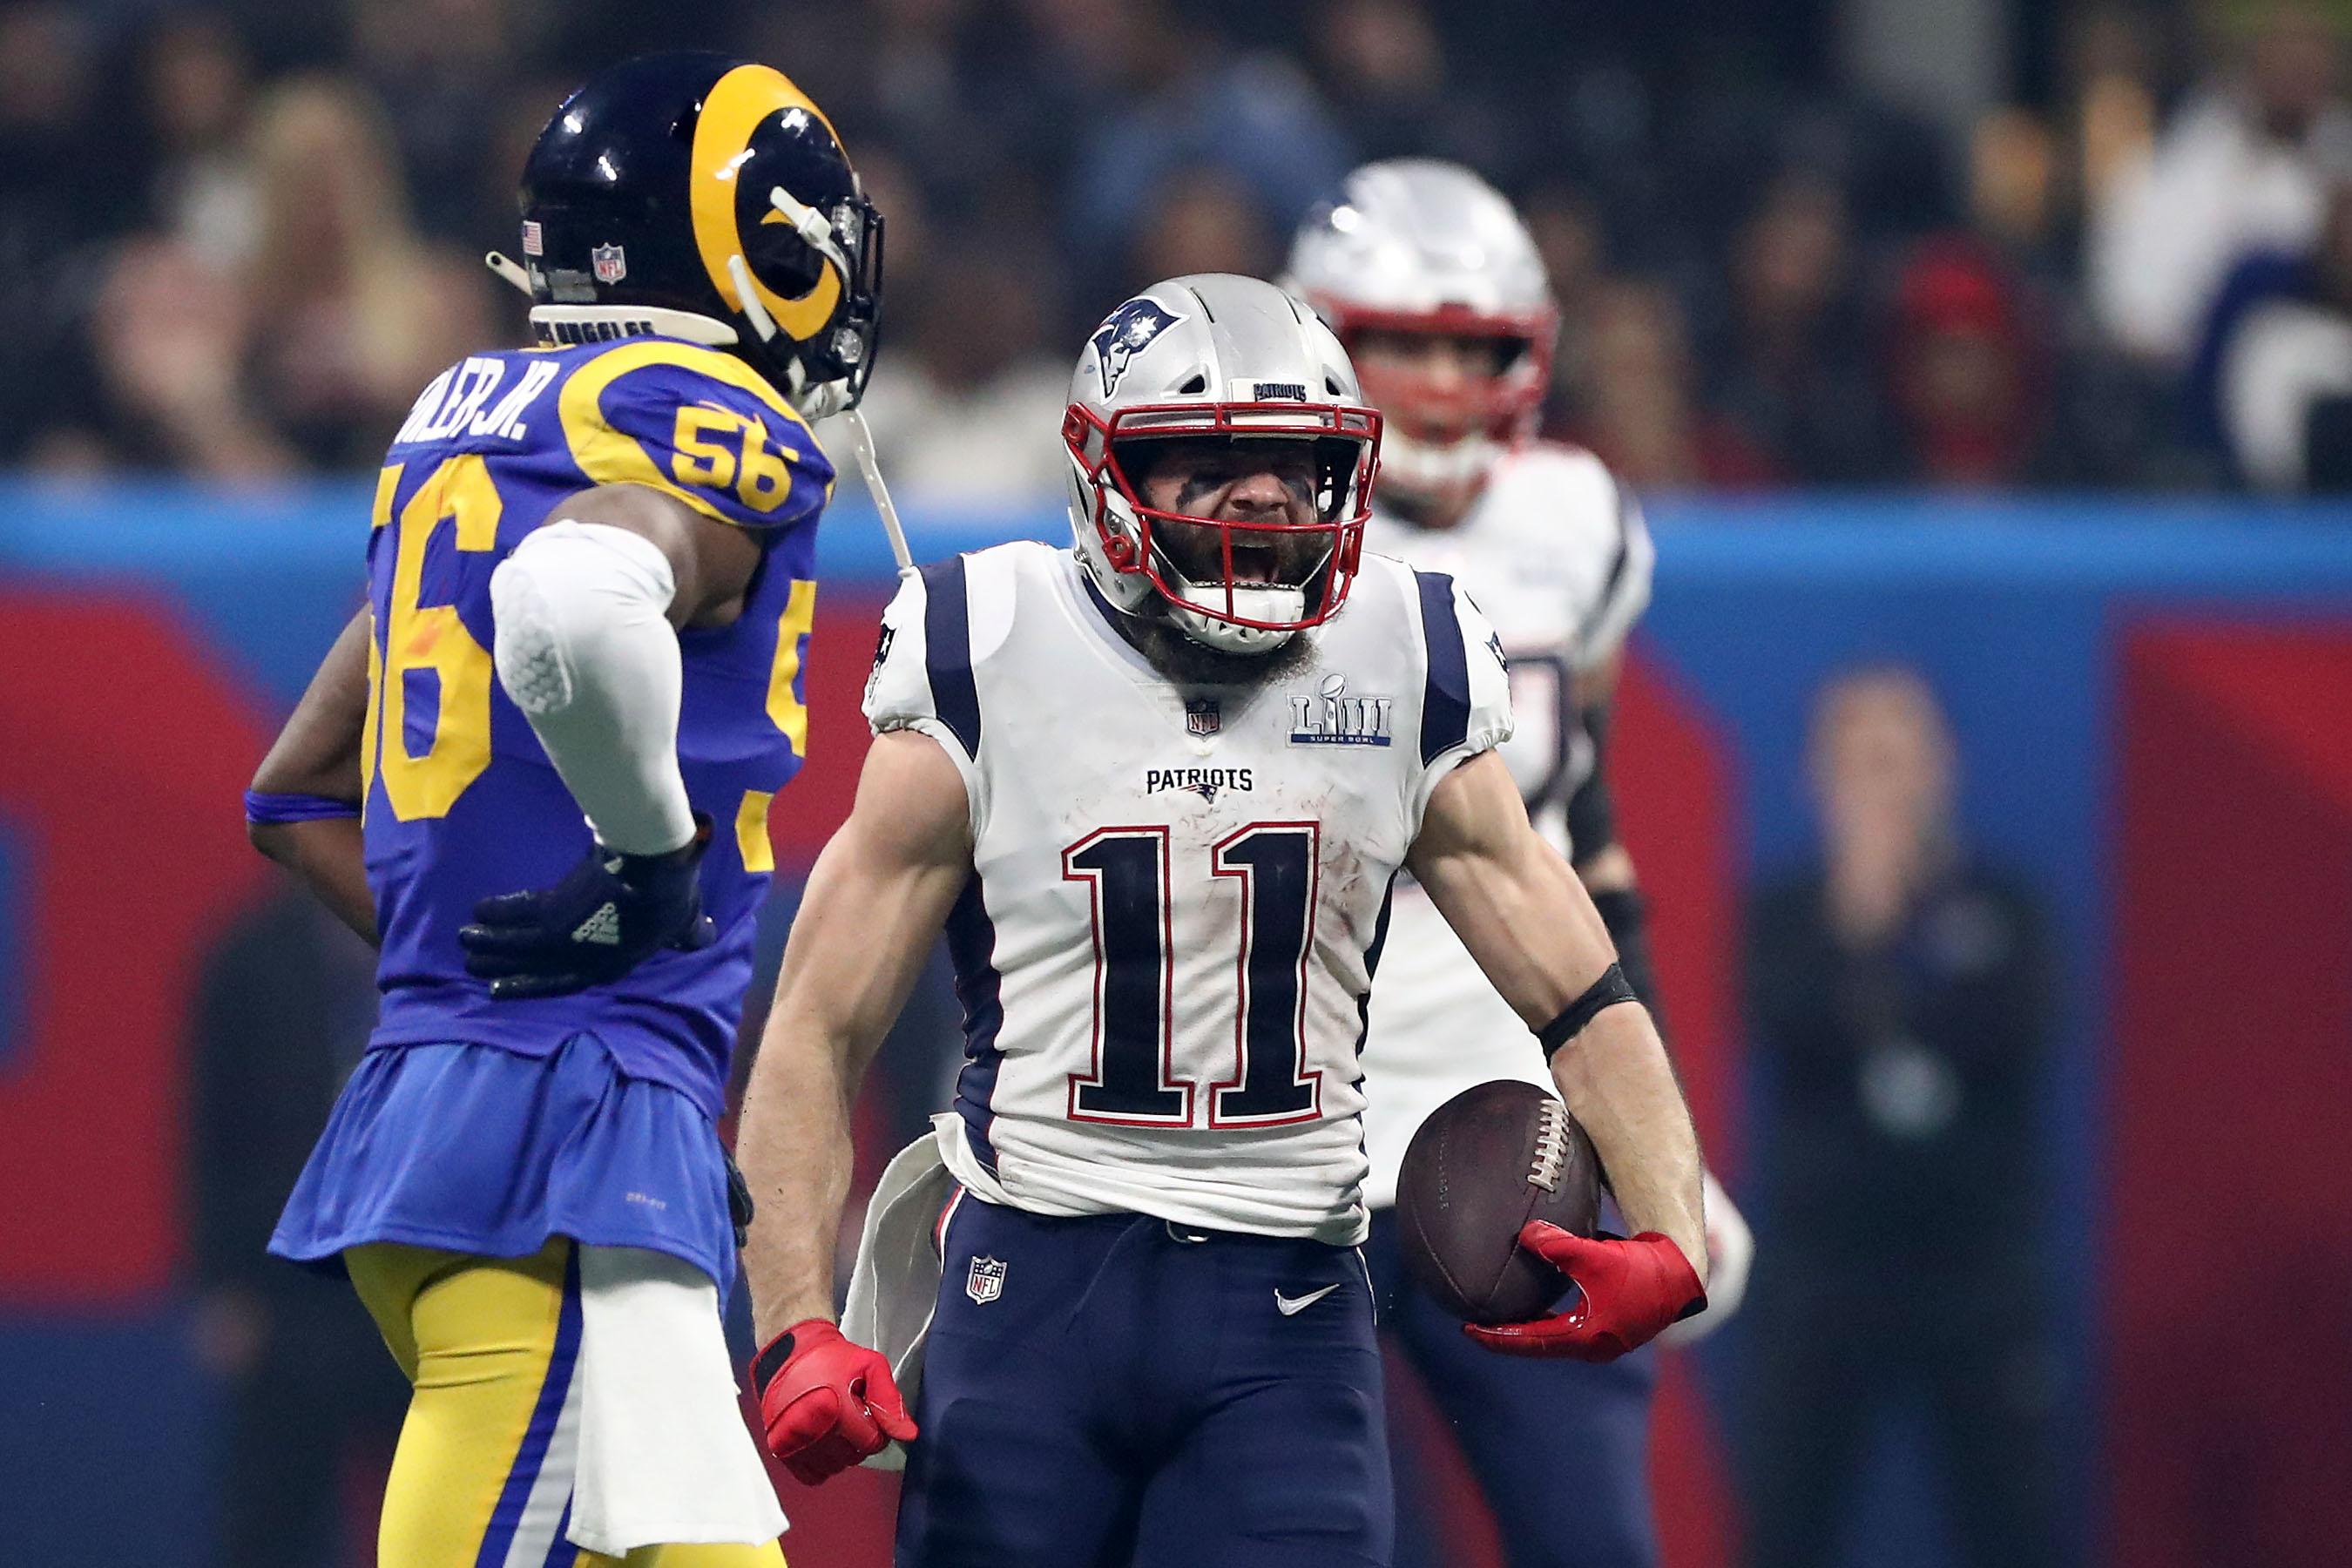 Julian Edelman: How Much Patriots Super Bowl 2019 MVP Makes | Money